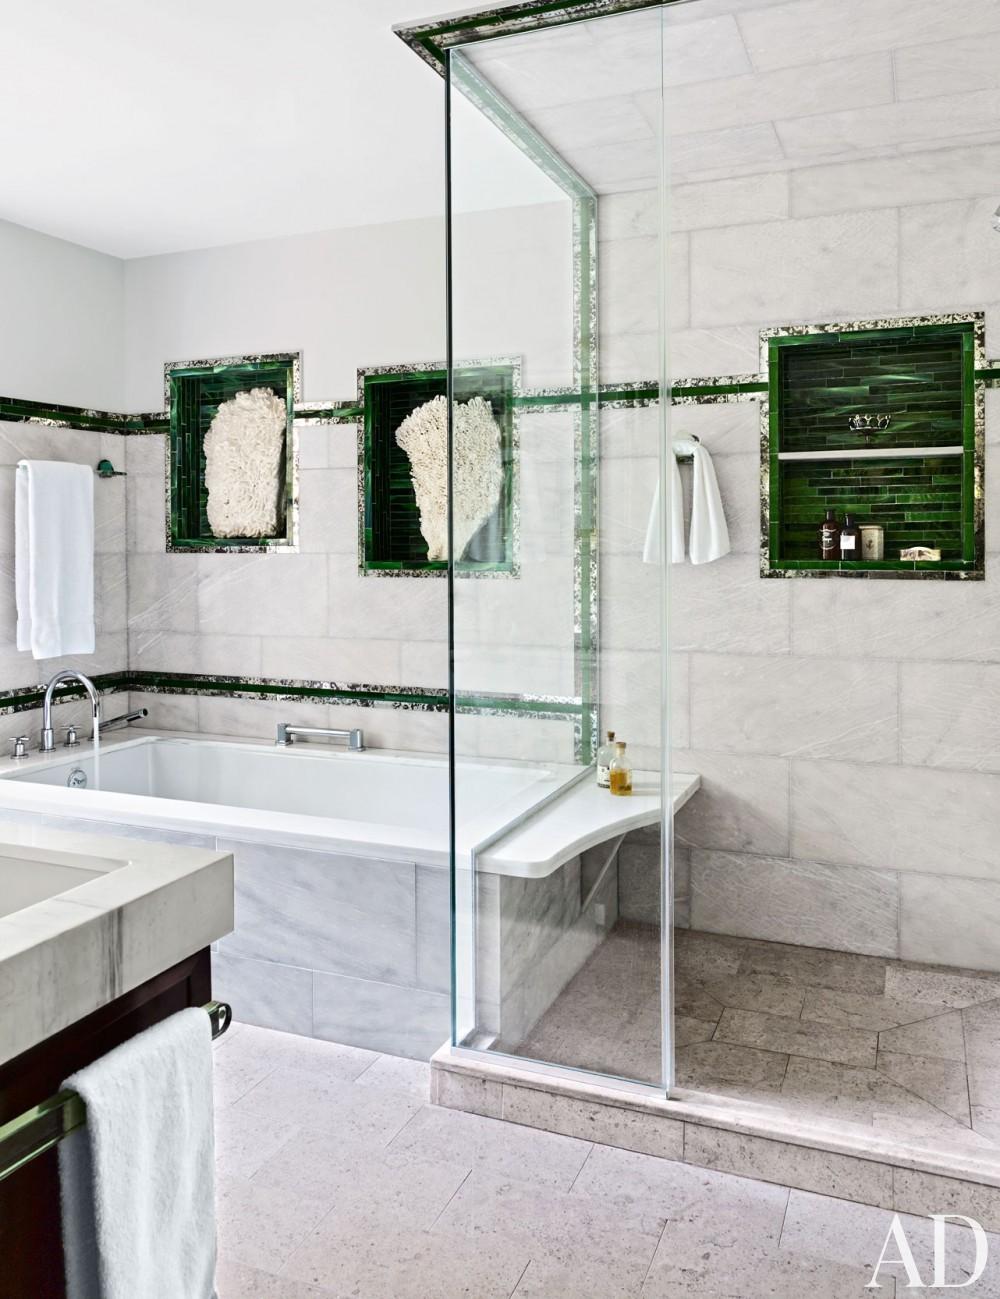 Traditional Bathroom by D\'Aquino Monaco and D\'Aquino Monaco in Hudson River Valley, NY